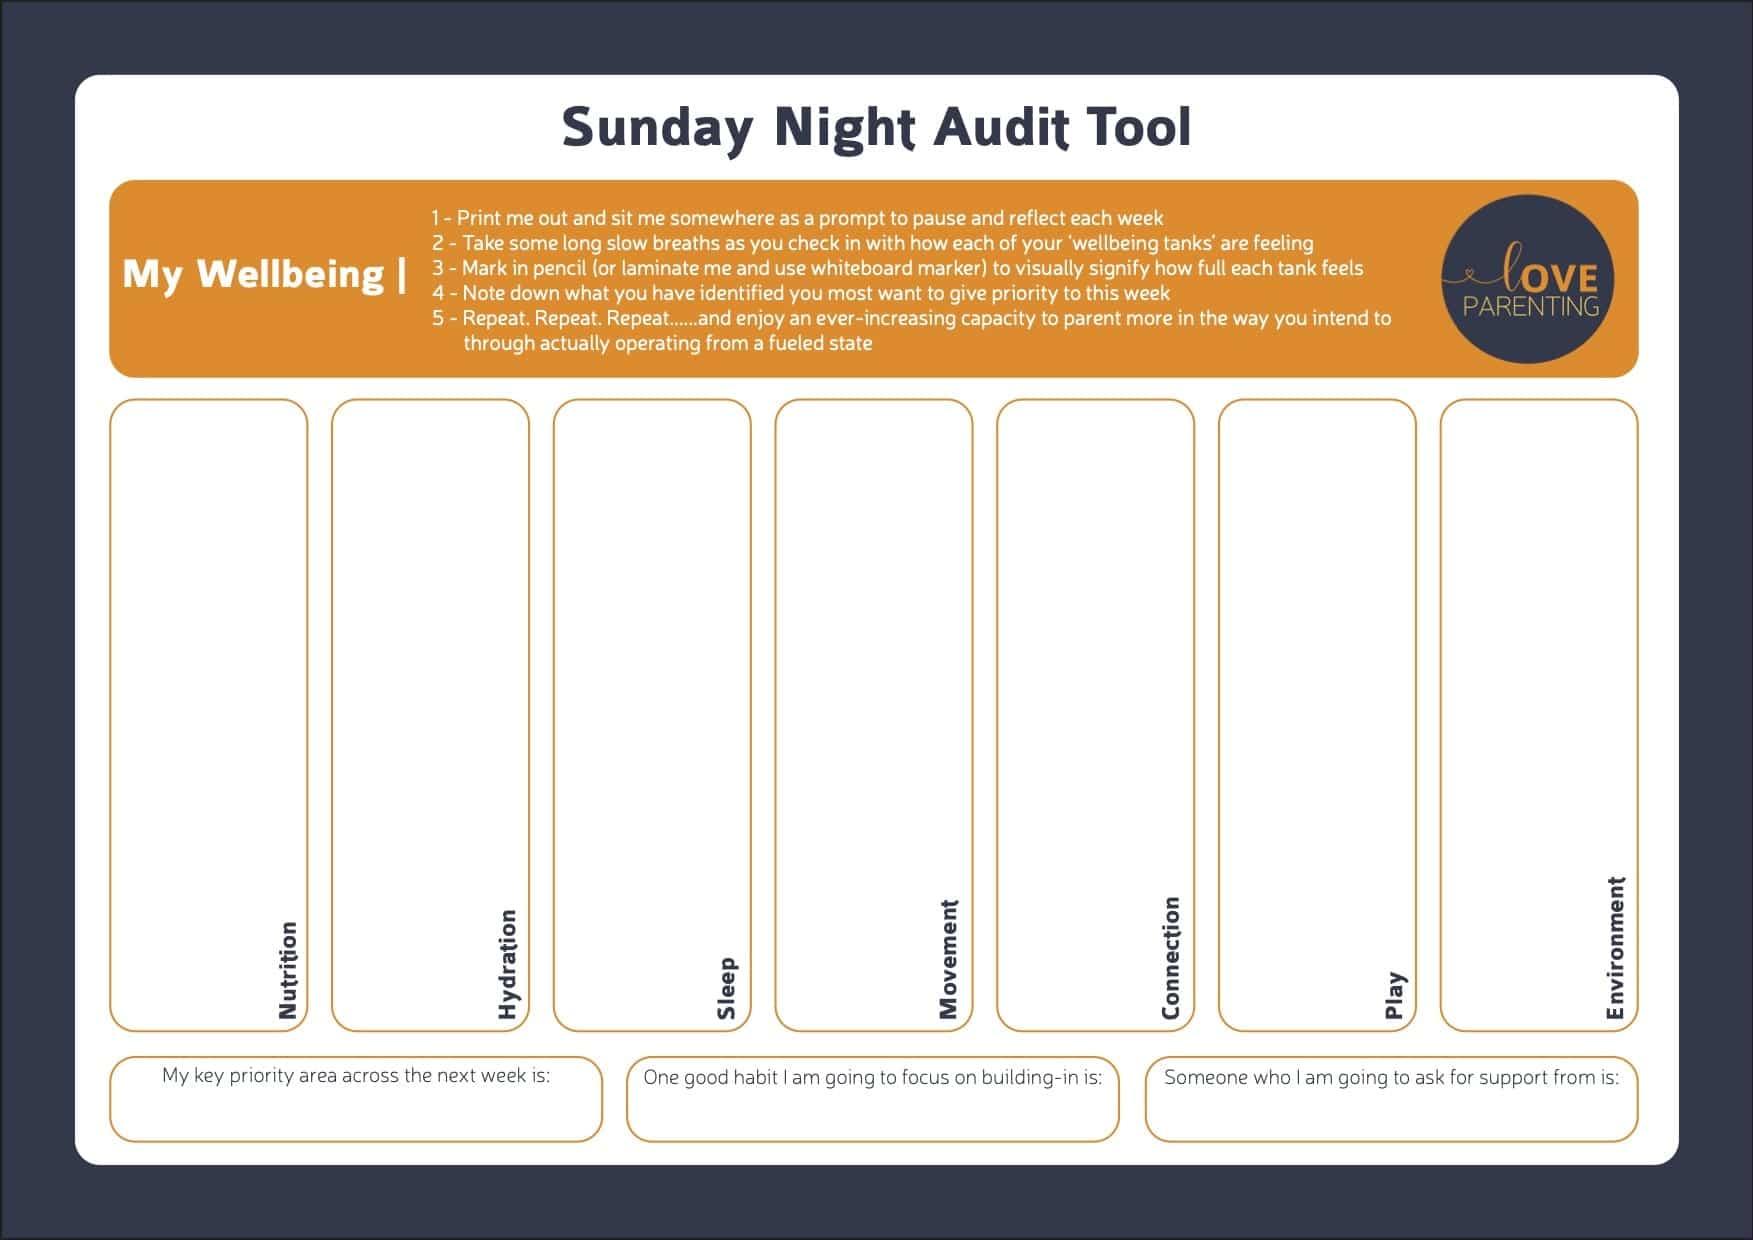 Sunday-Night-Audit-Tool